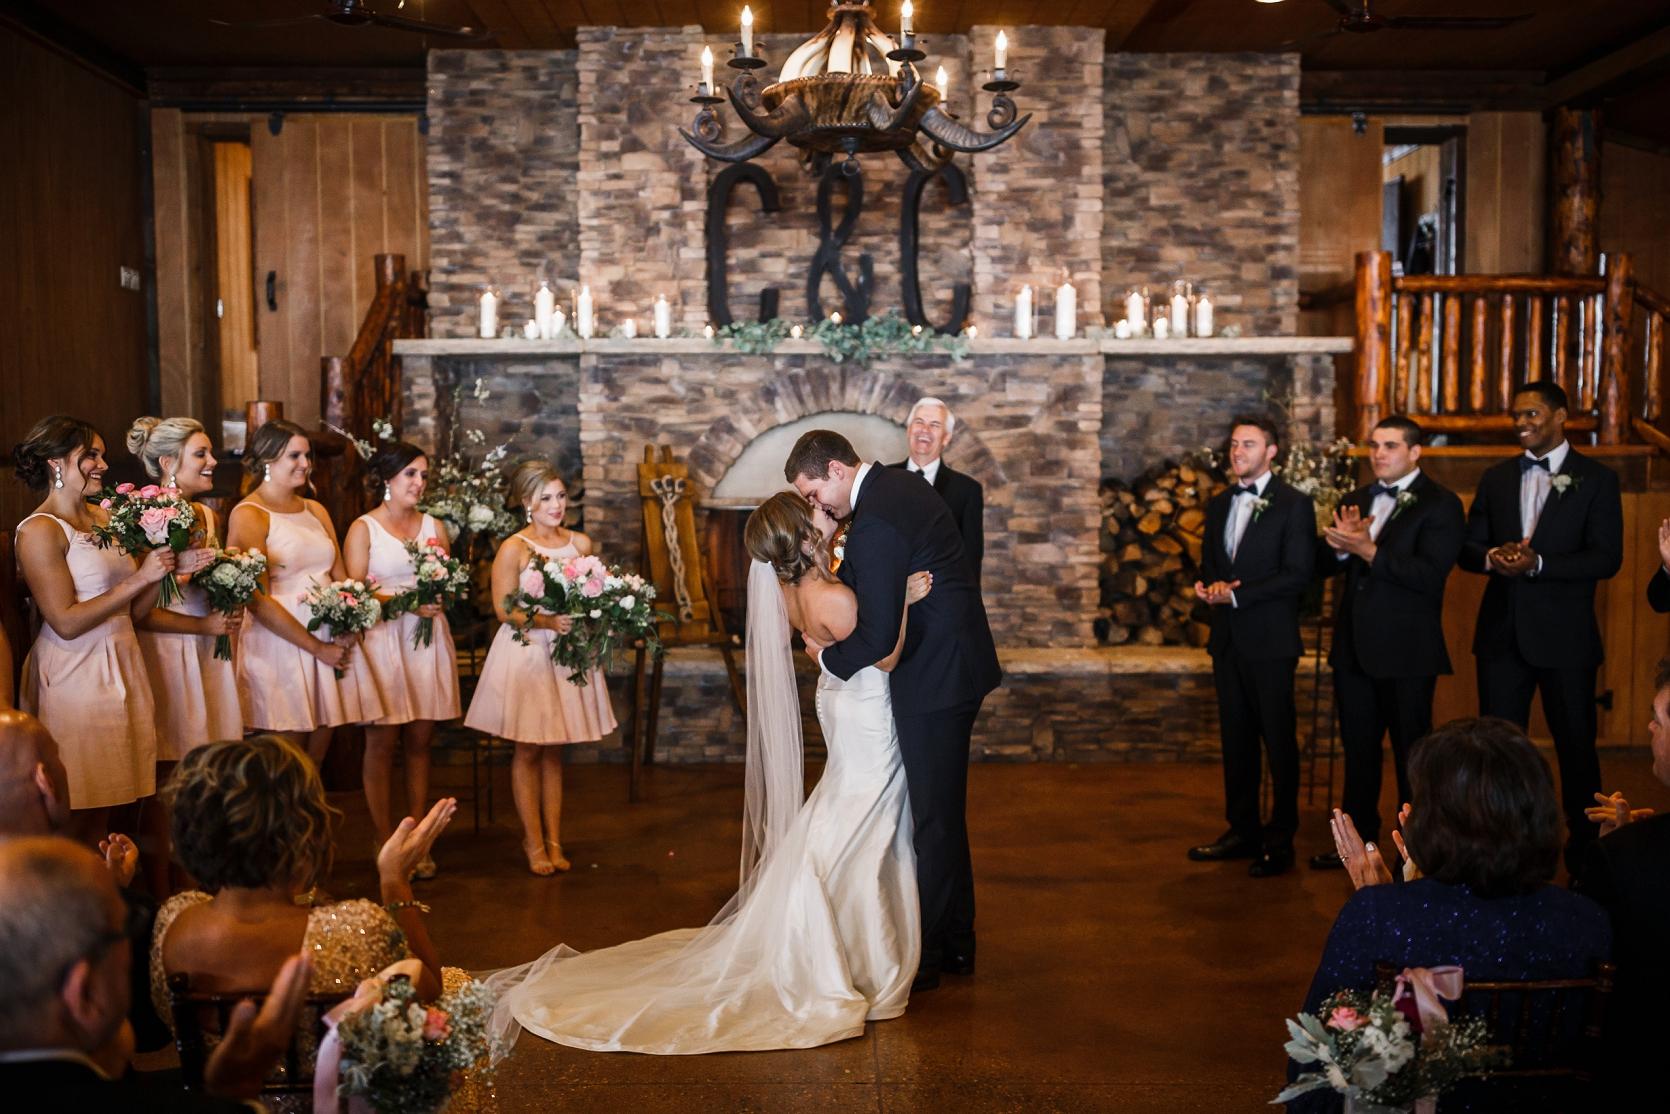 Spruce_Mountain_Ranch_Wedding_0024